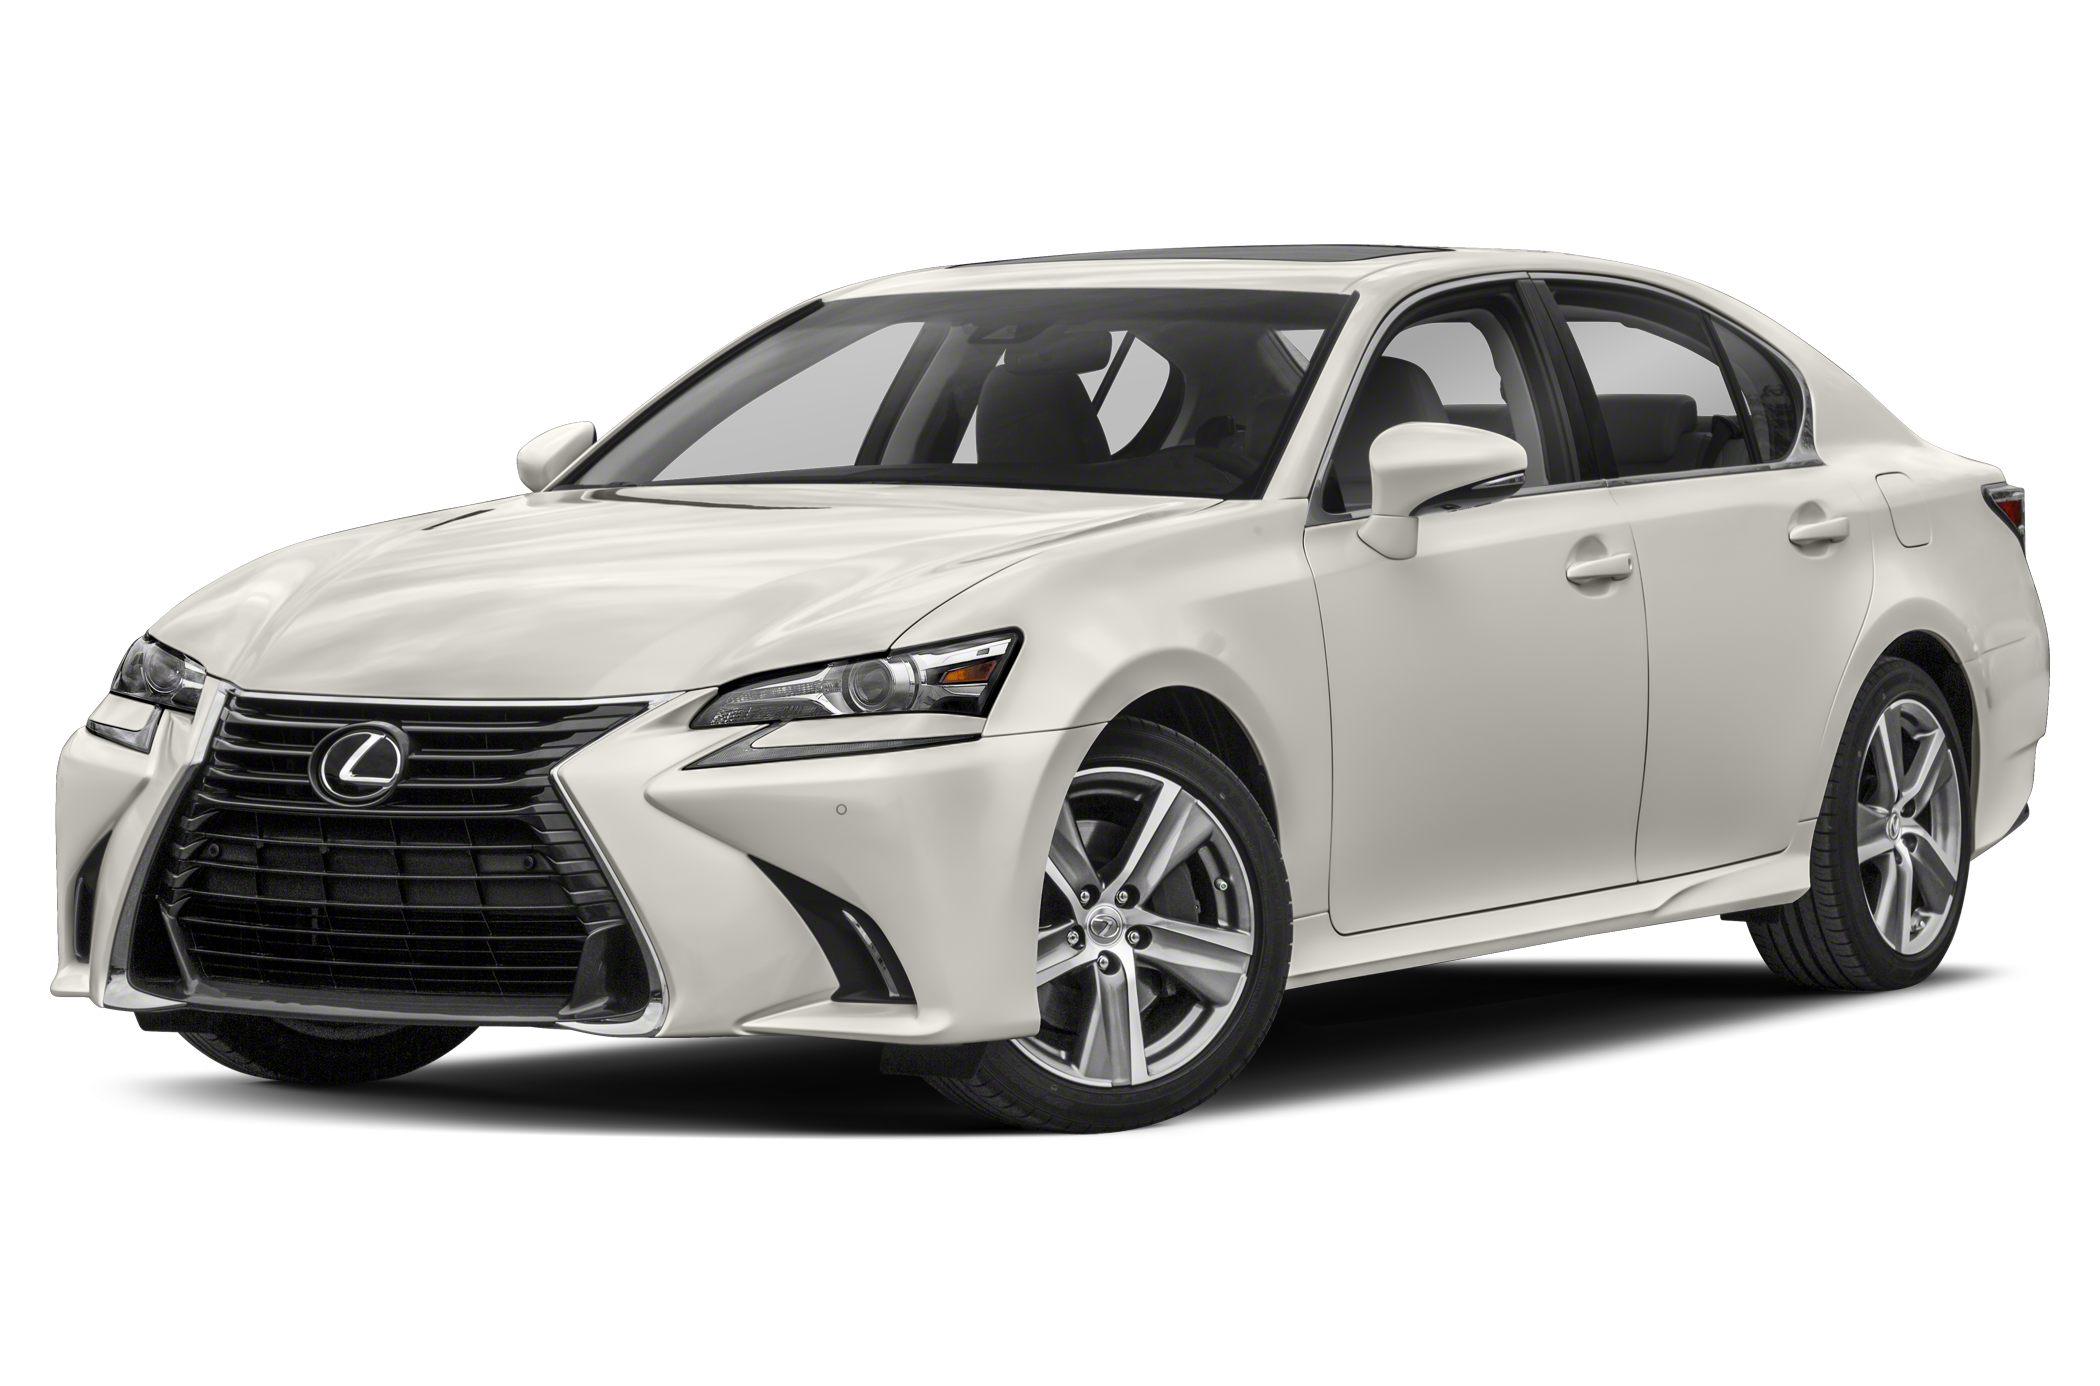 Infiniti q70 prices reviews and new model information autoblog 2018 lexus gs 350 vanachro Choice Image